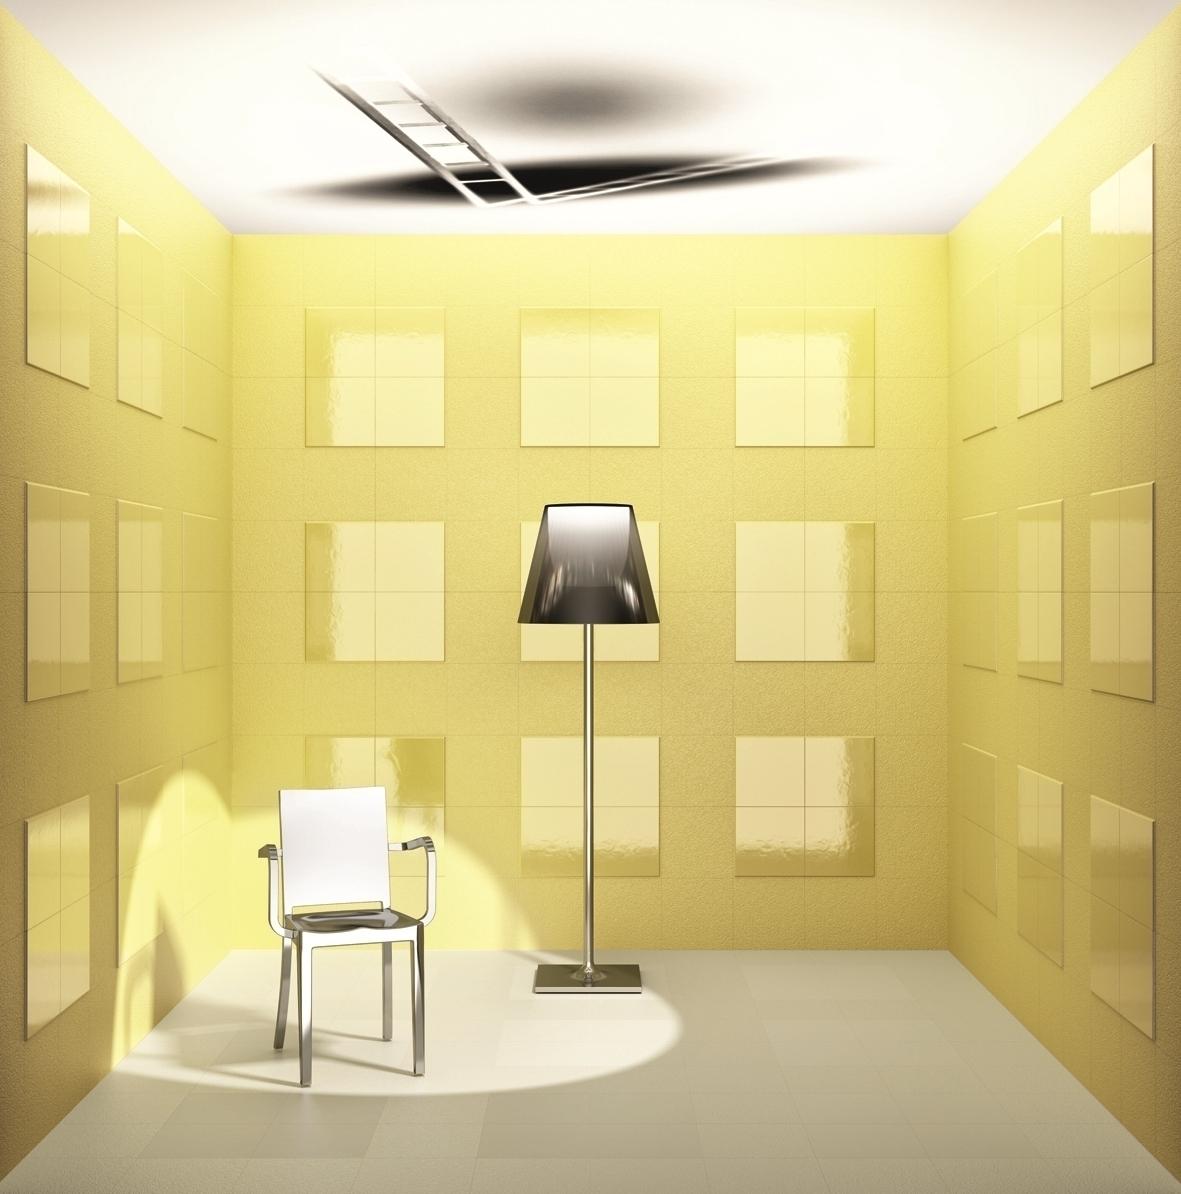 philippe starck per ceramica sant 39 agostino. Black Bedroom Furniture Sets. Home Design Ideas